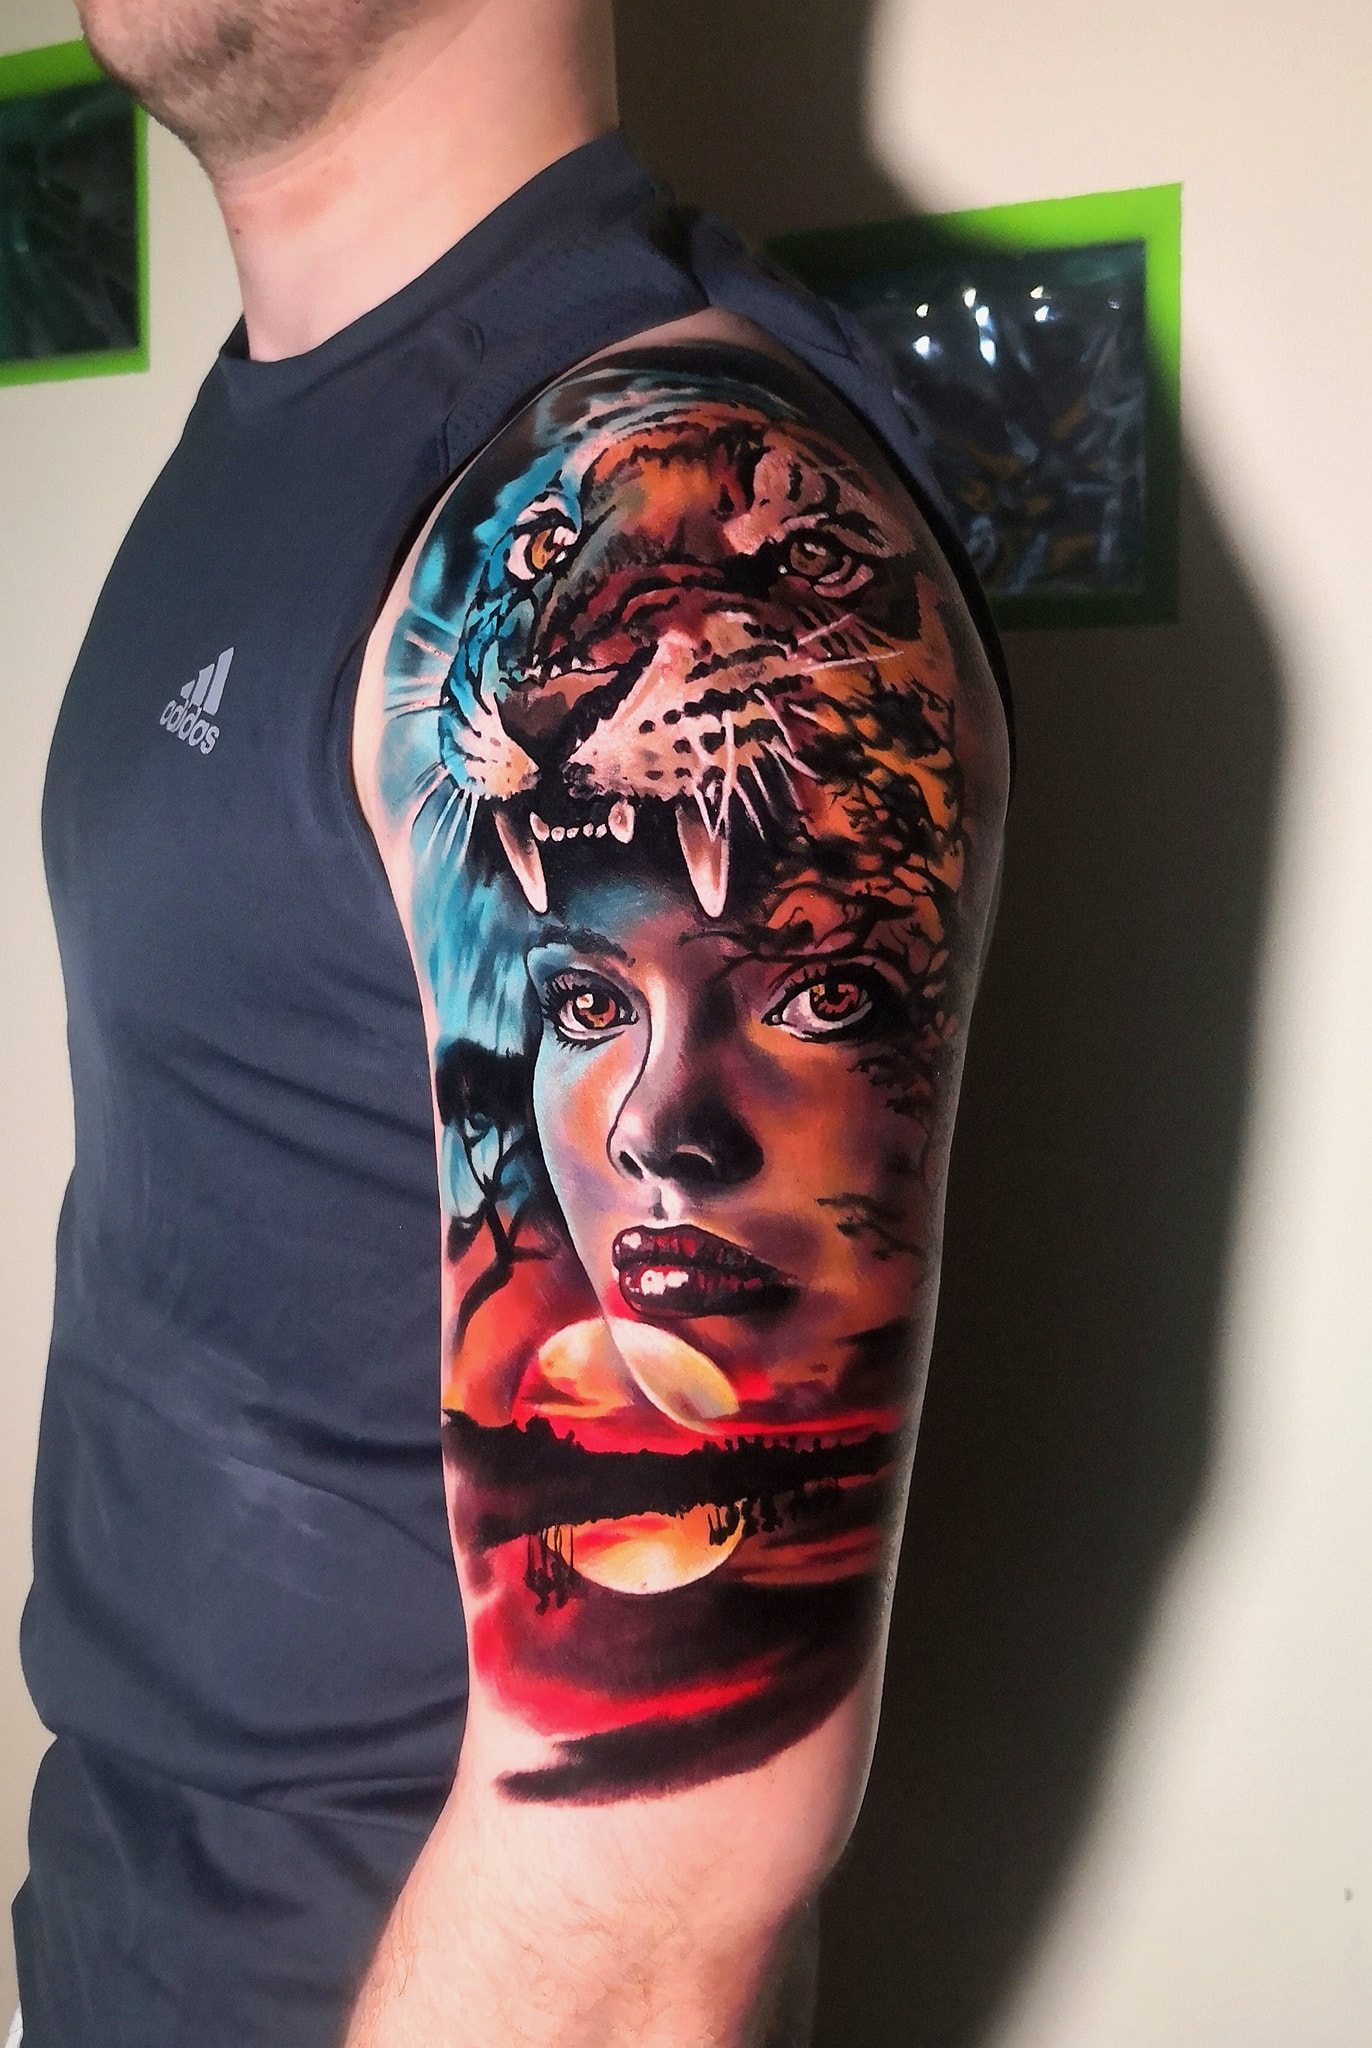 Inksearch tattoo Szymon Szumala